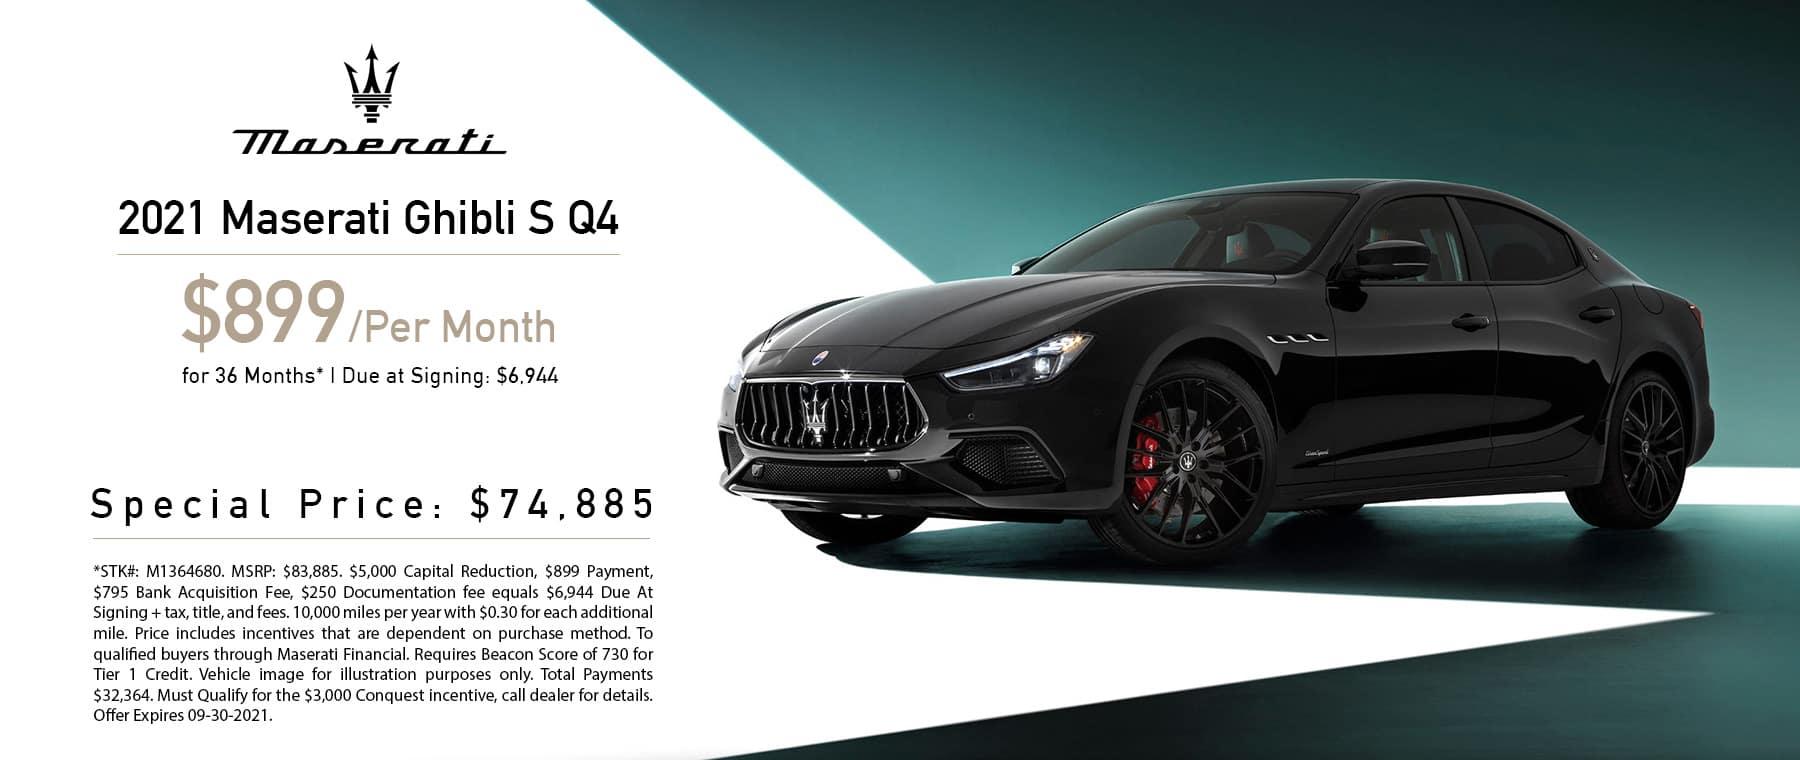 Maserati_2021_Ghibli_Slide_Sep2021_1